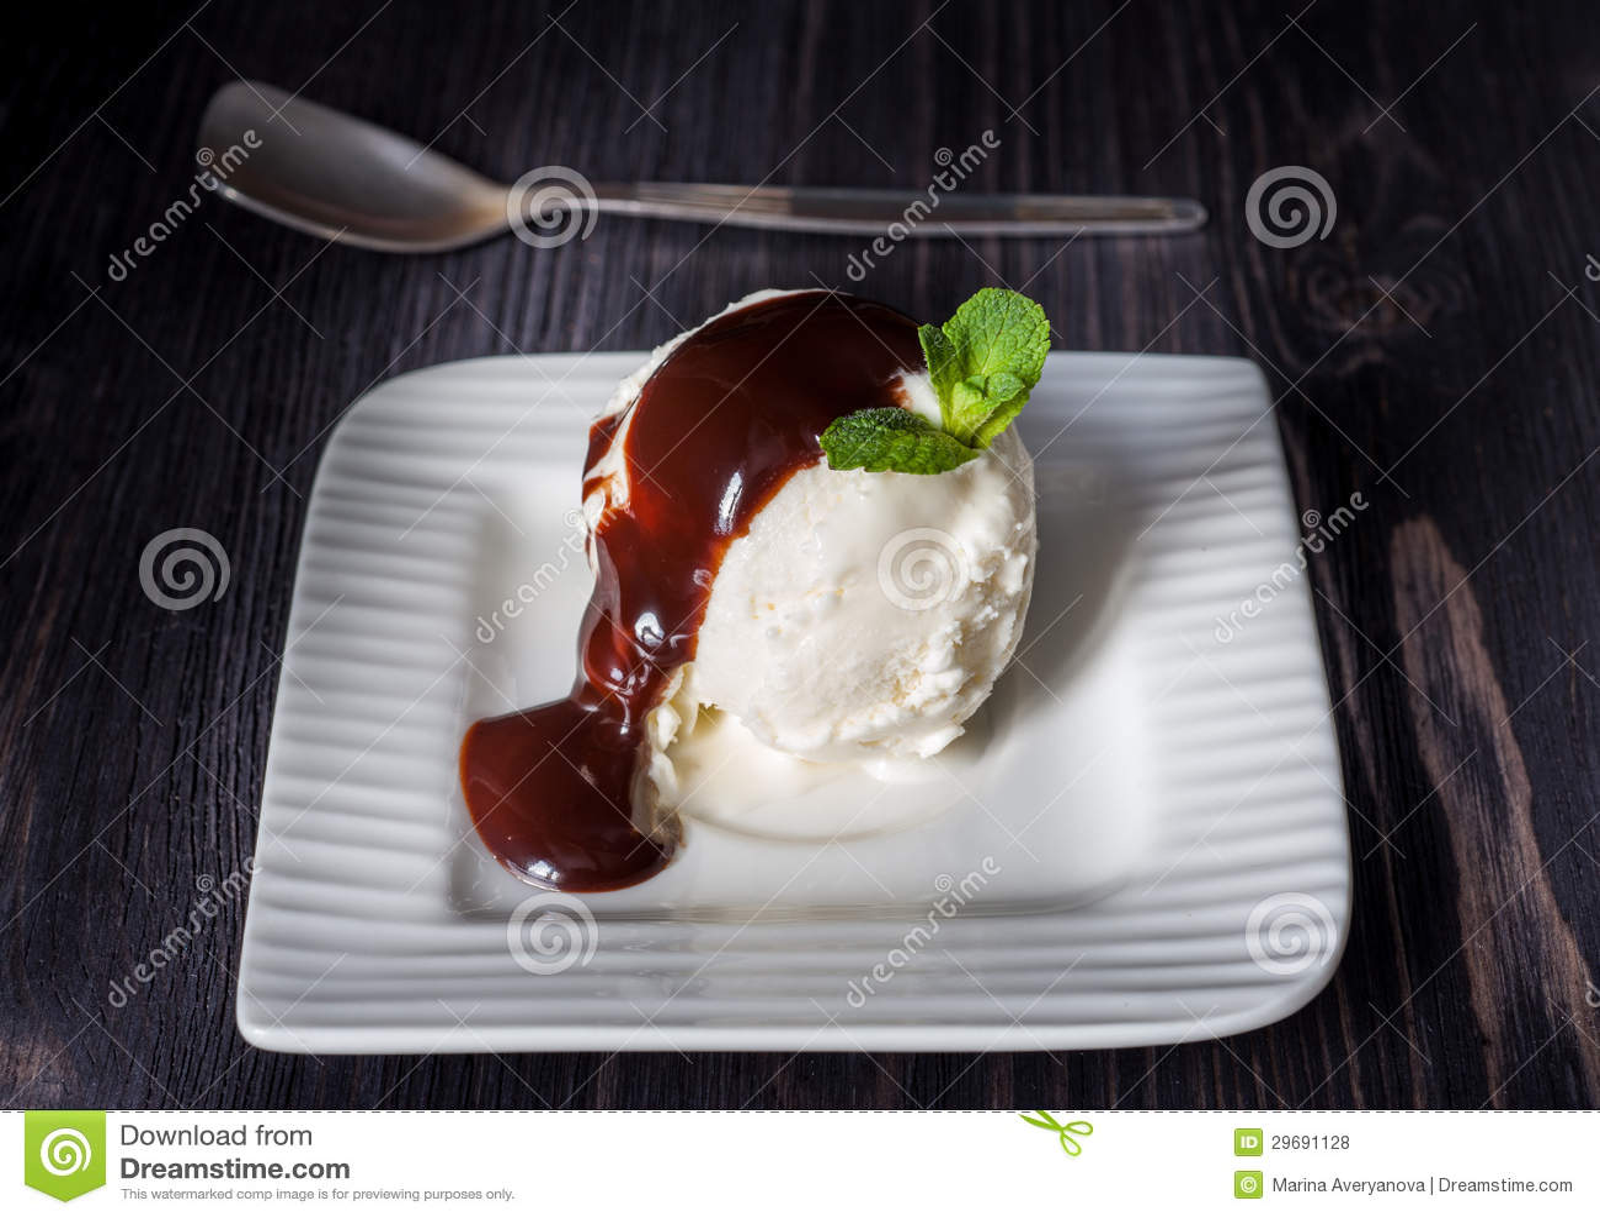 vanilla ice cream with chocolate syrup 2017 - Chocolate Milk Recipe